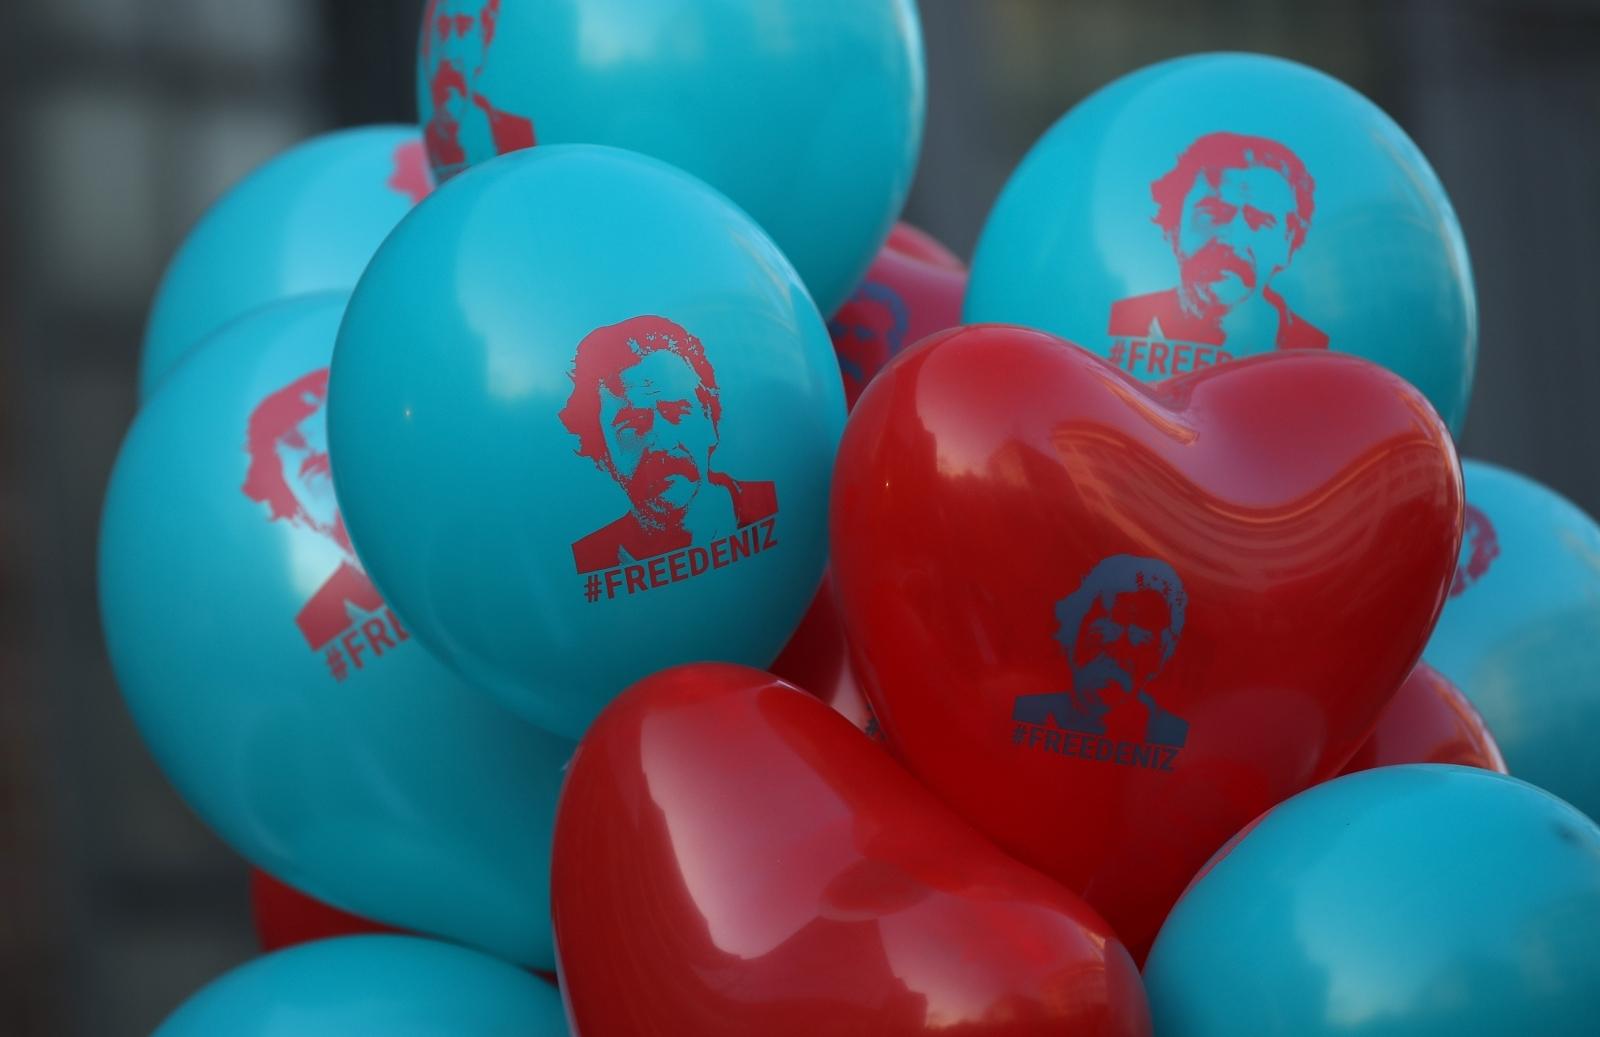 Free Deniz Yucel balloons in Germany